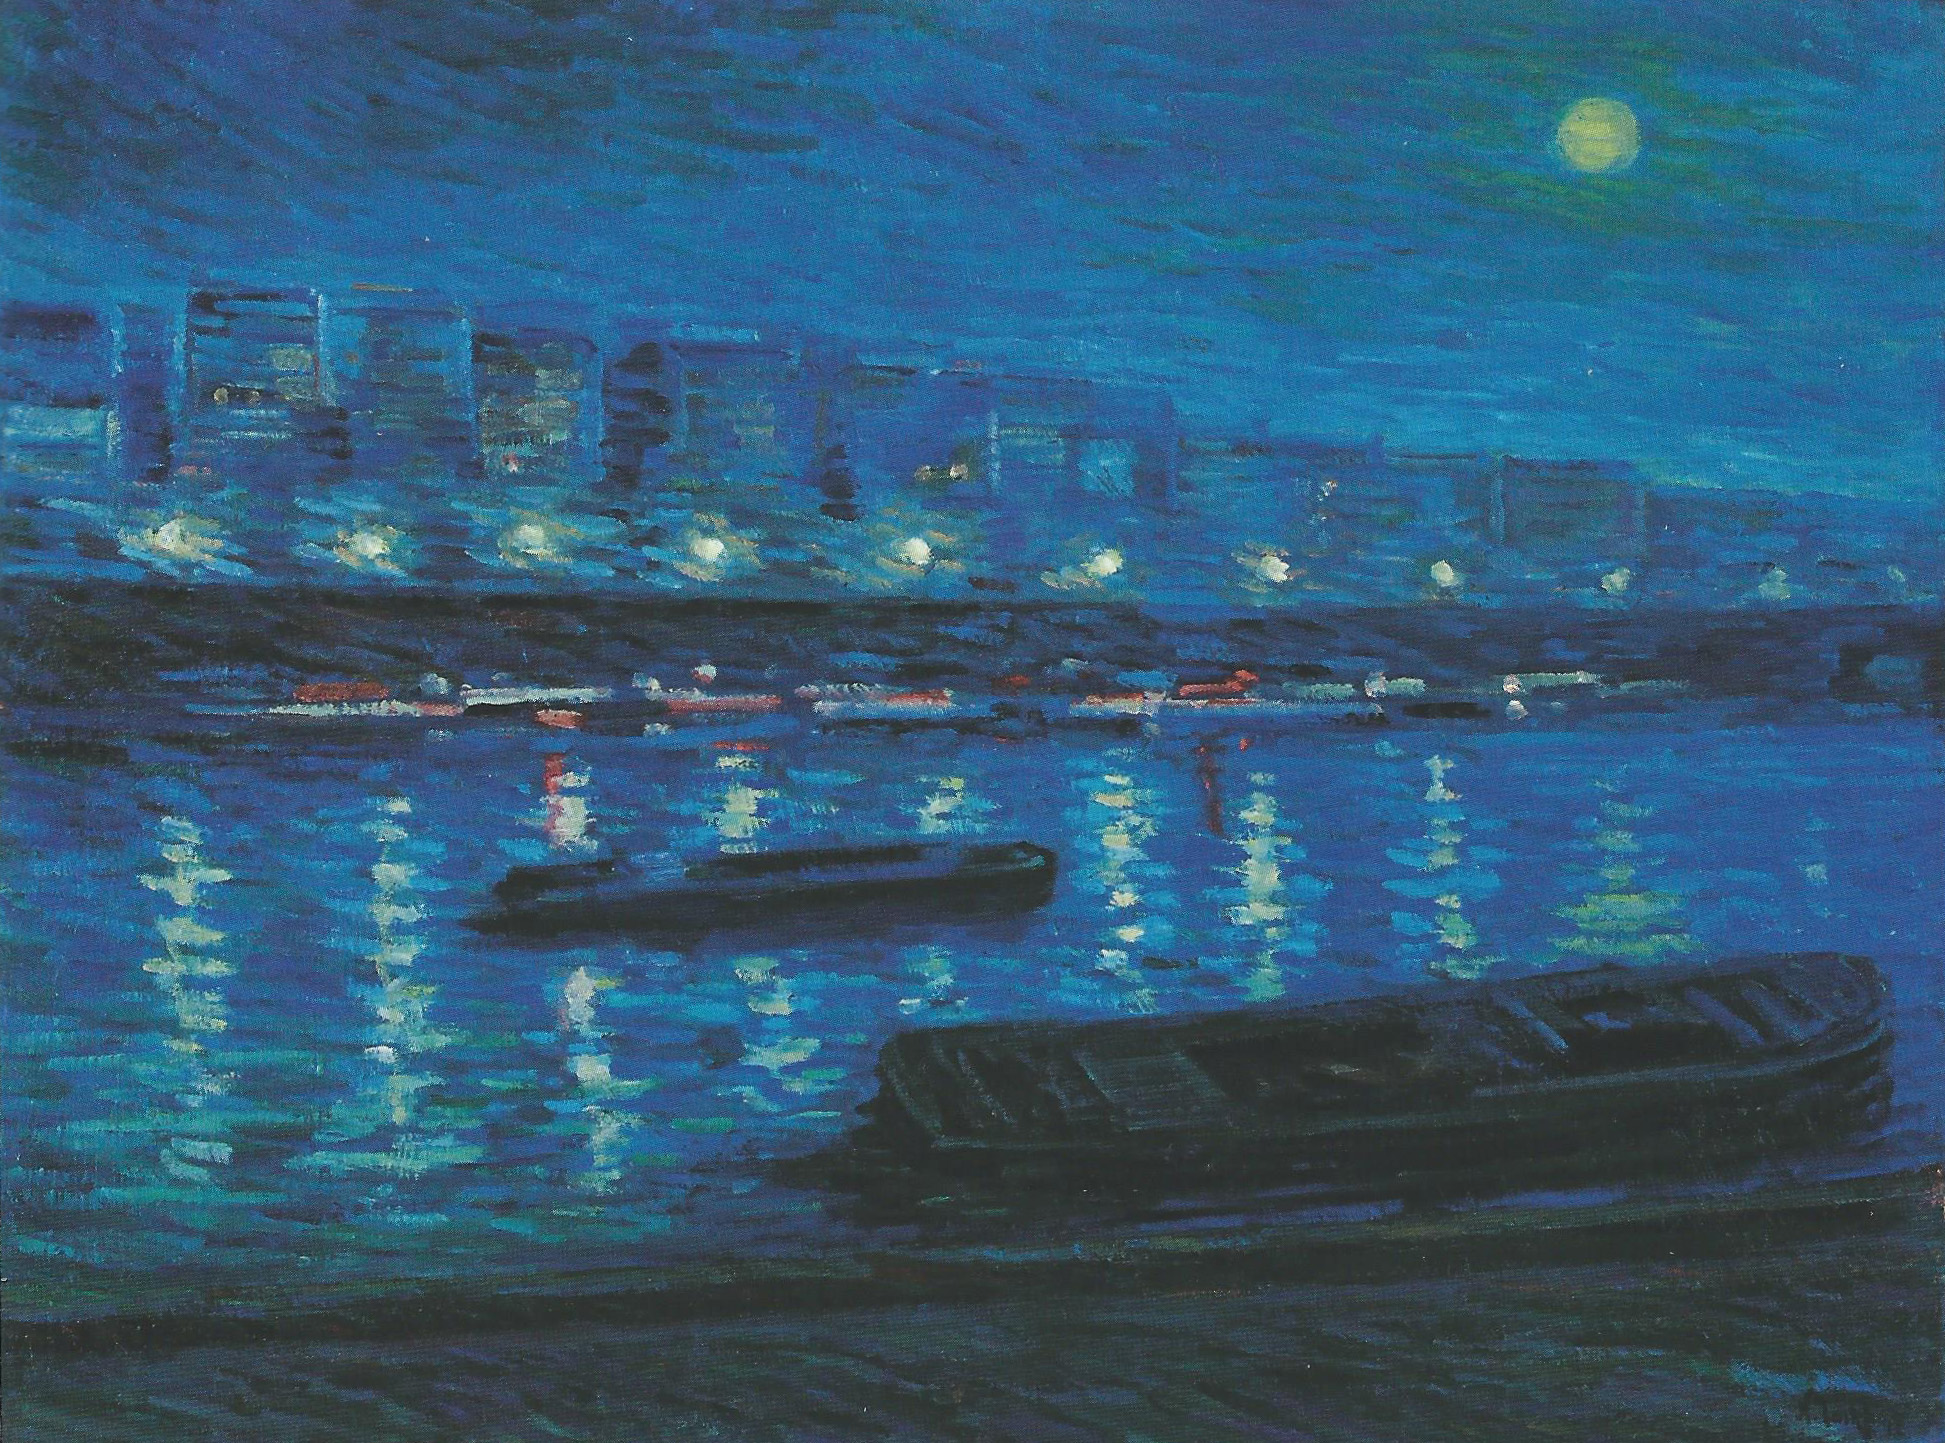 Николай Тархов - Барки на Сене пейзаж картина маслом